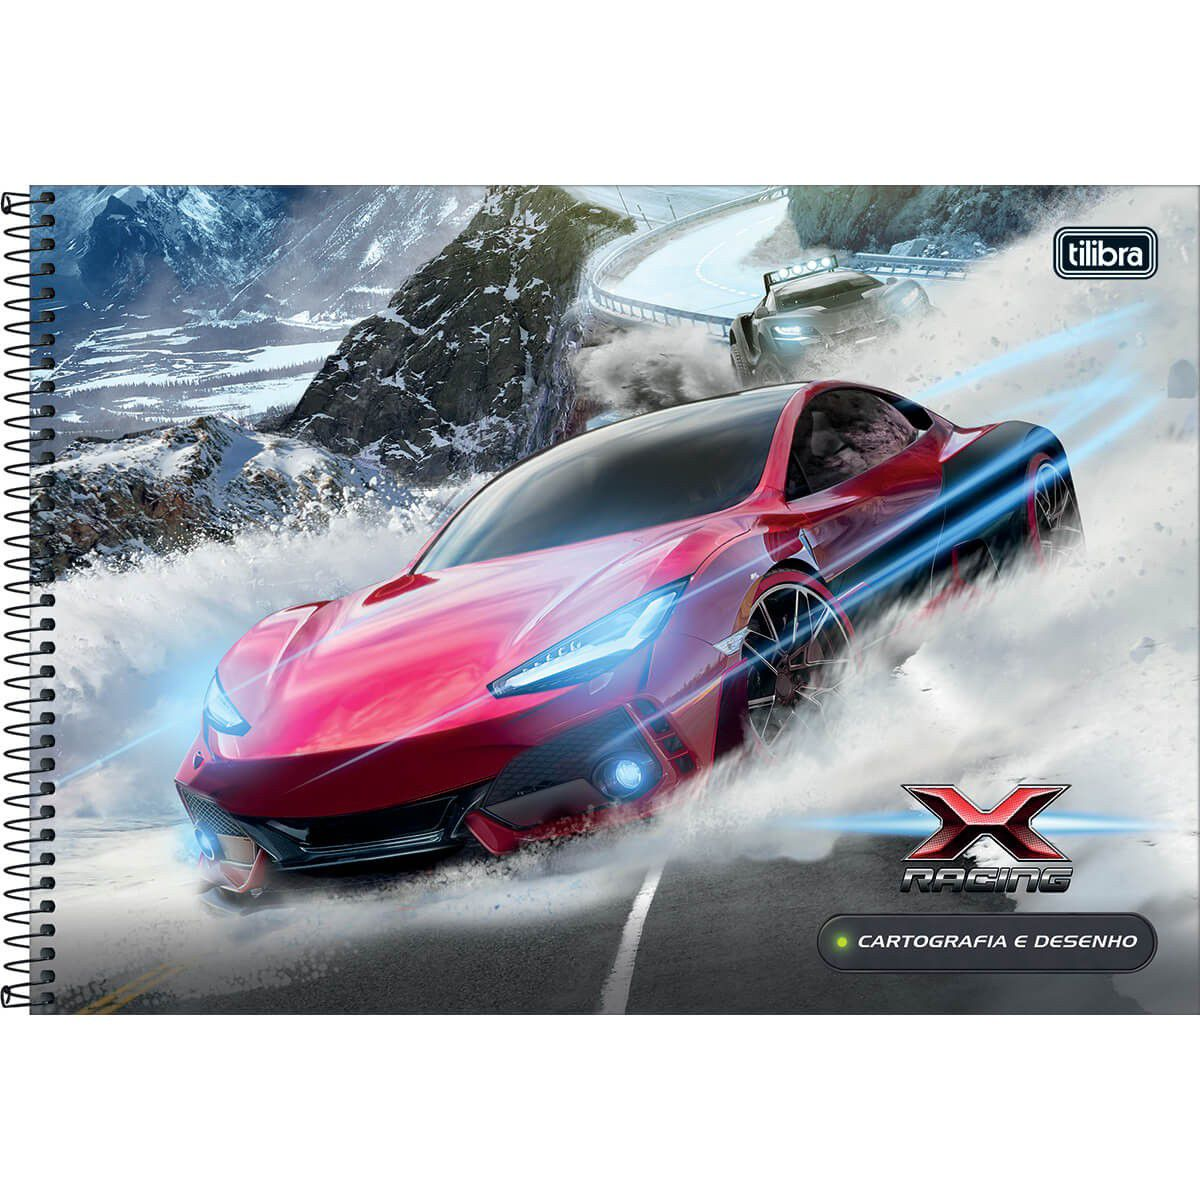 Caderno Tilibra Capa Dura Cartografia Espiral X-Racing 80 Fls 306126 27852